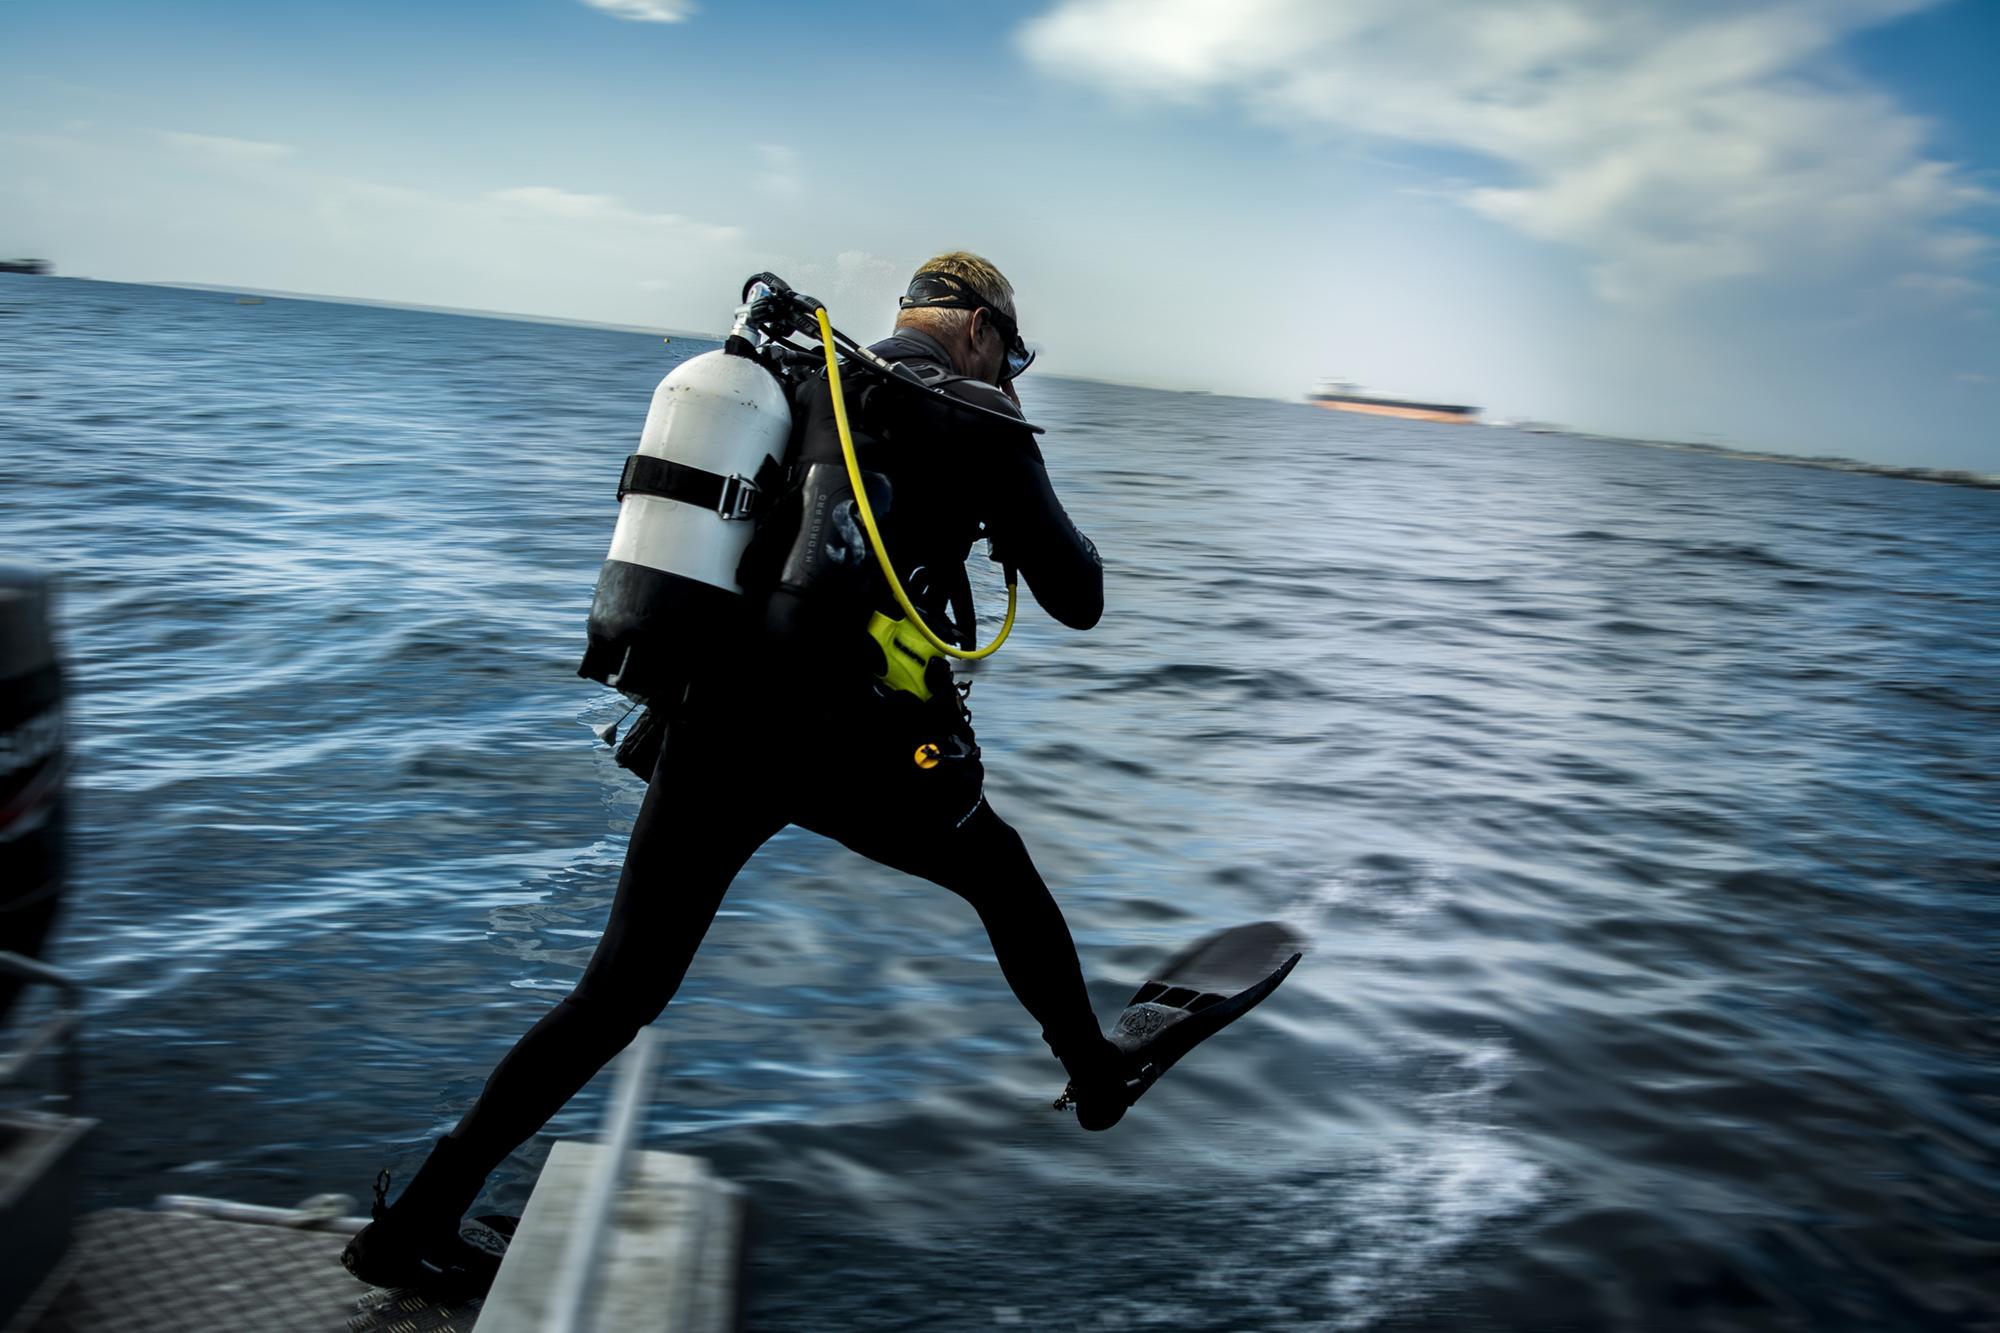 Limassol Shipwreck Scuba Diving - Kalliopi Dive College